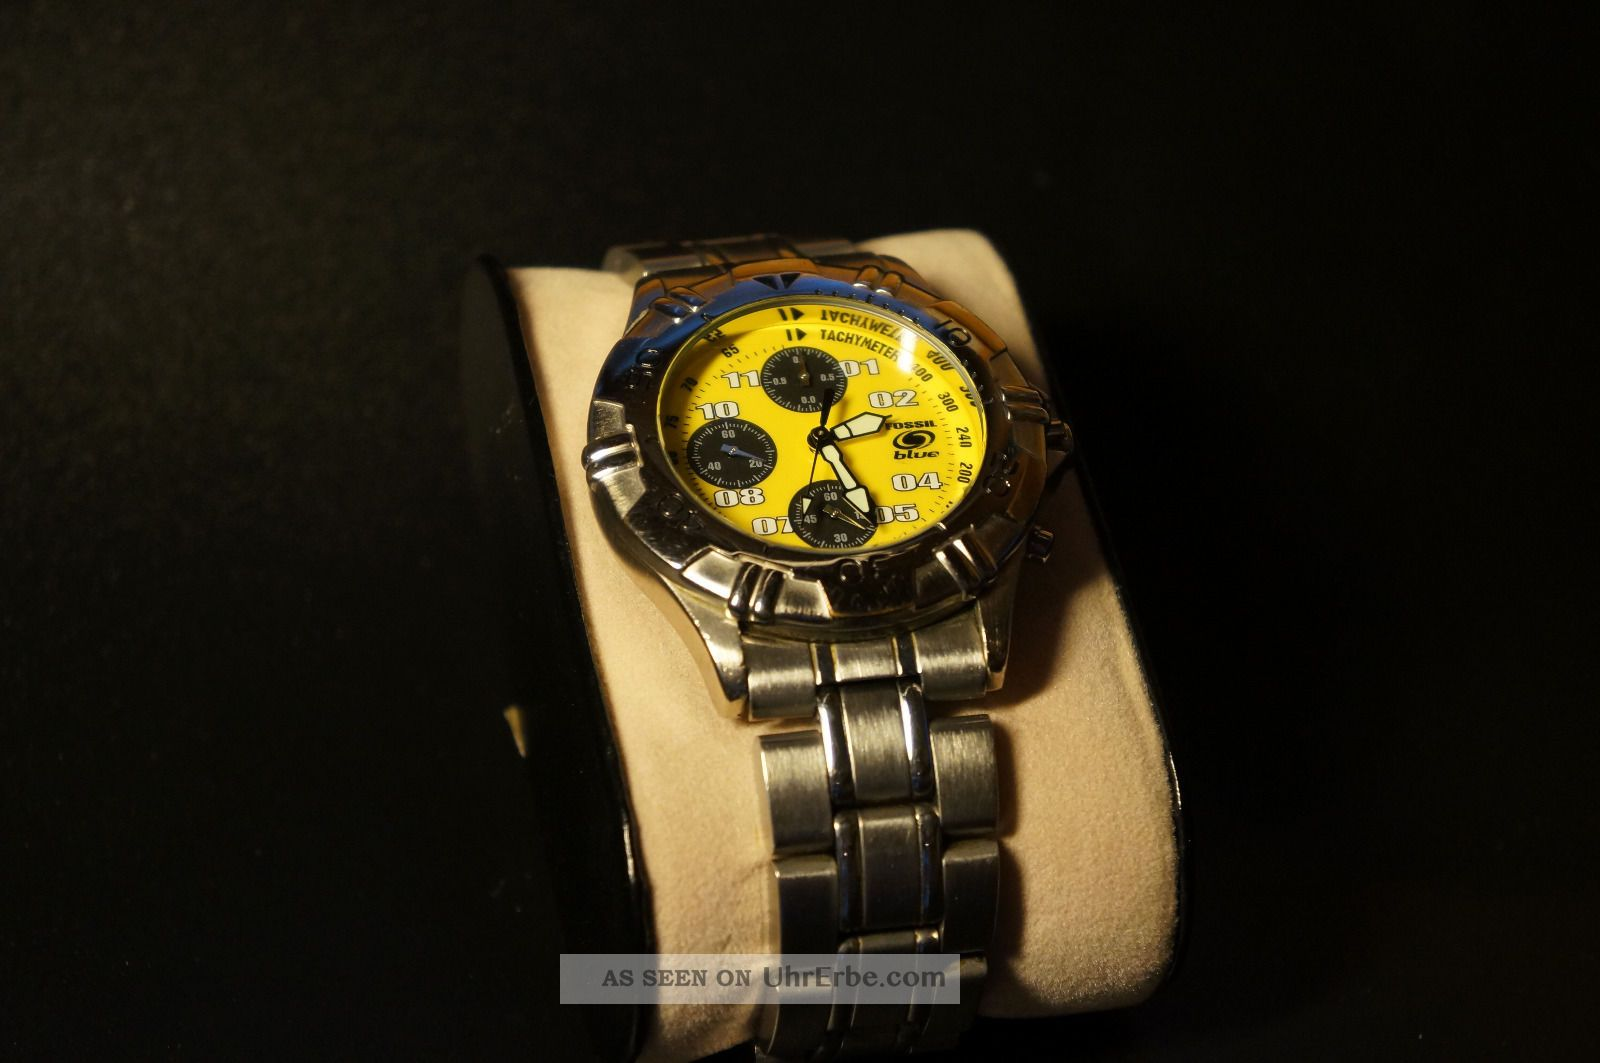 Fossil Herrenarmbanduhr Armbanduhren Bild